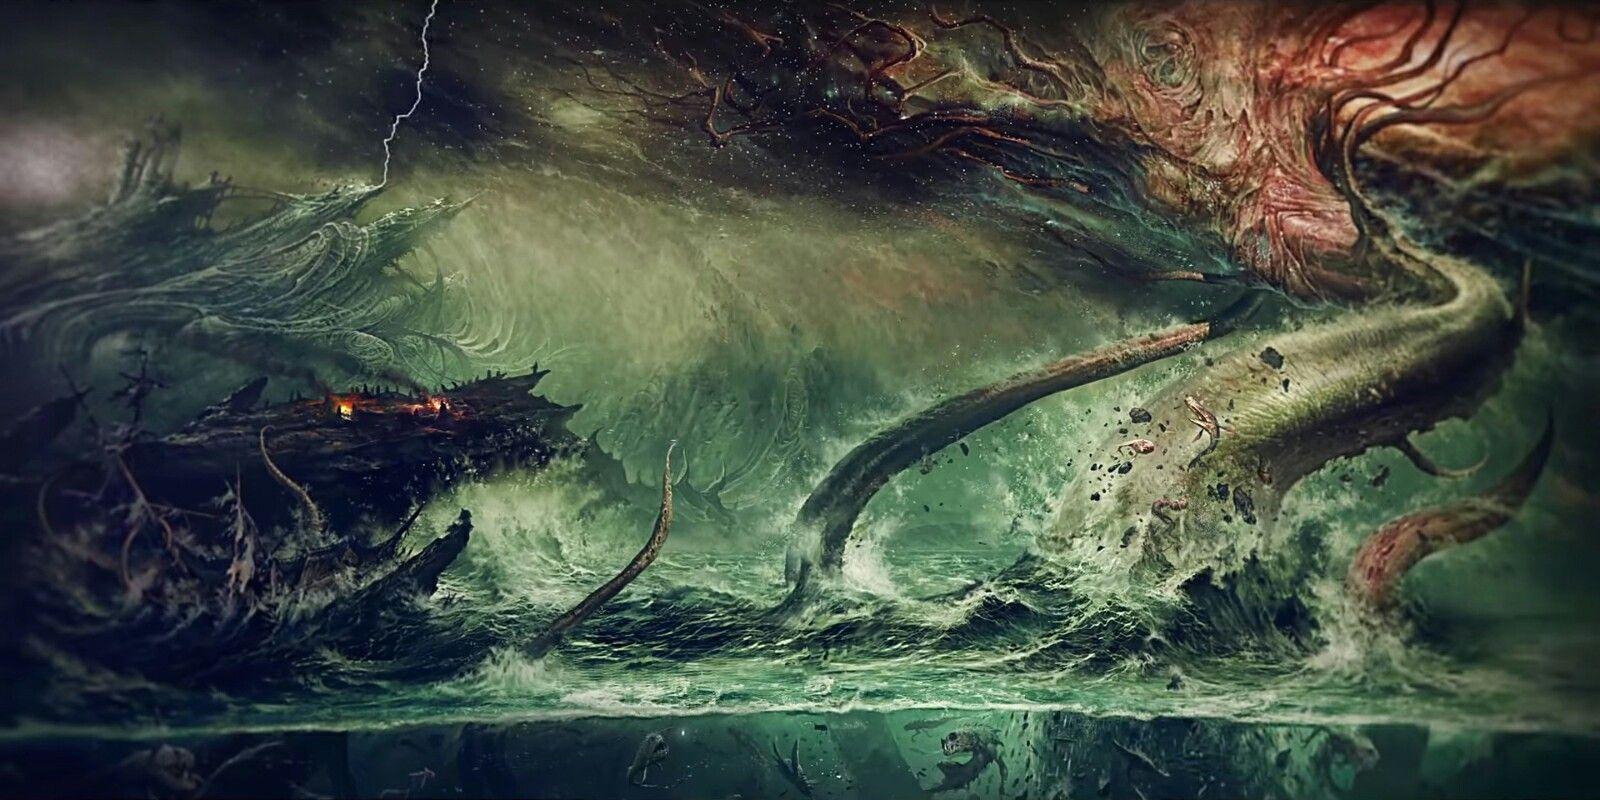 Lovecraftian Wallpaper Full Gothic Artwork Lovecraftian Lovecraftian Horror